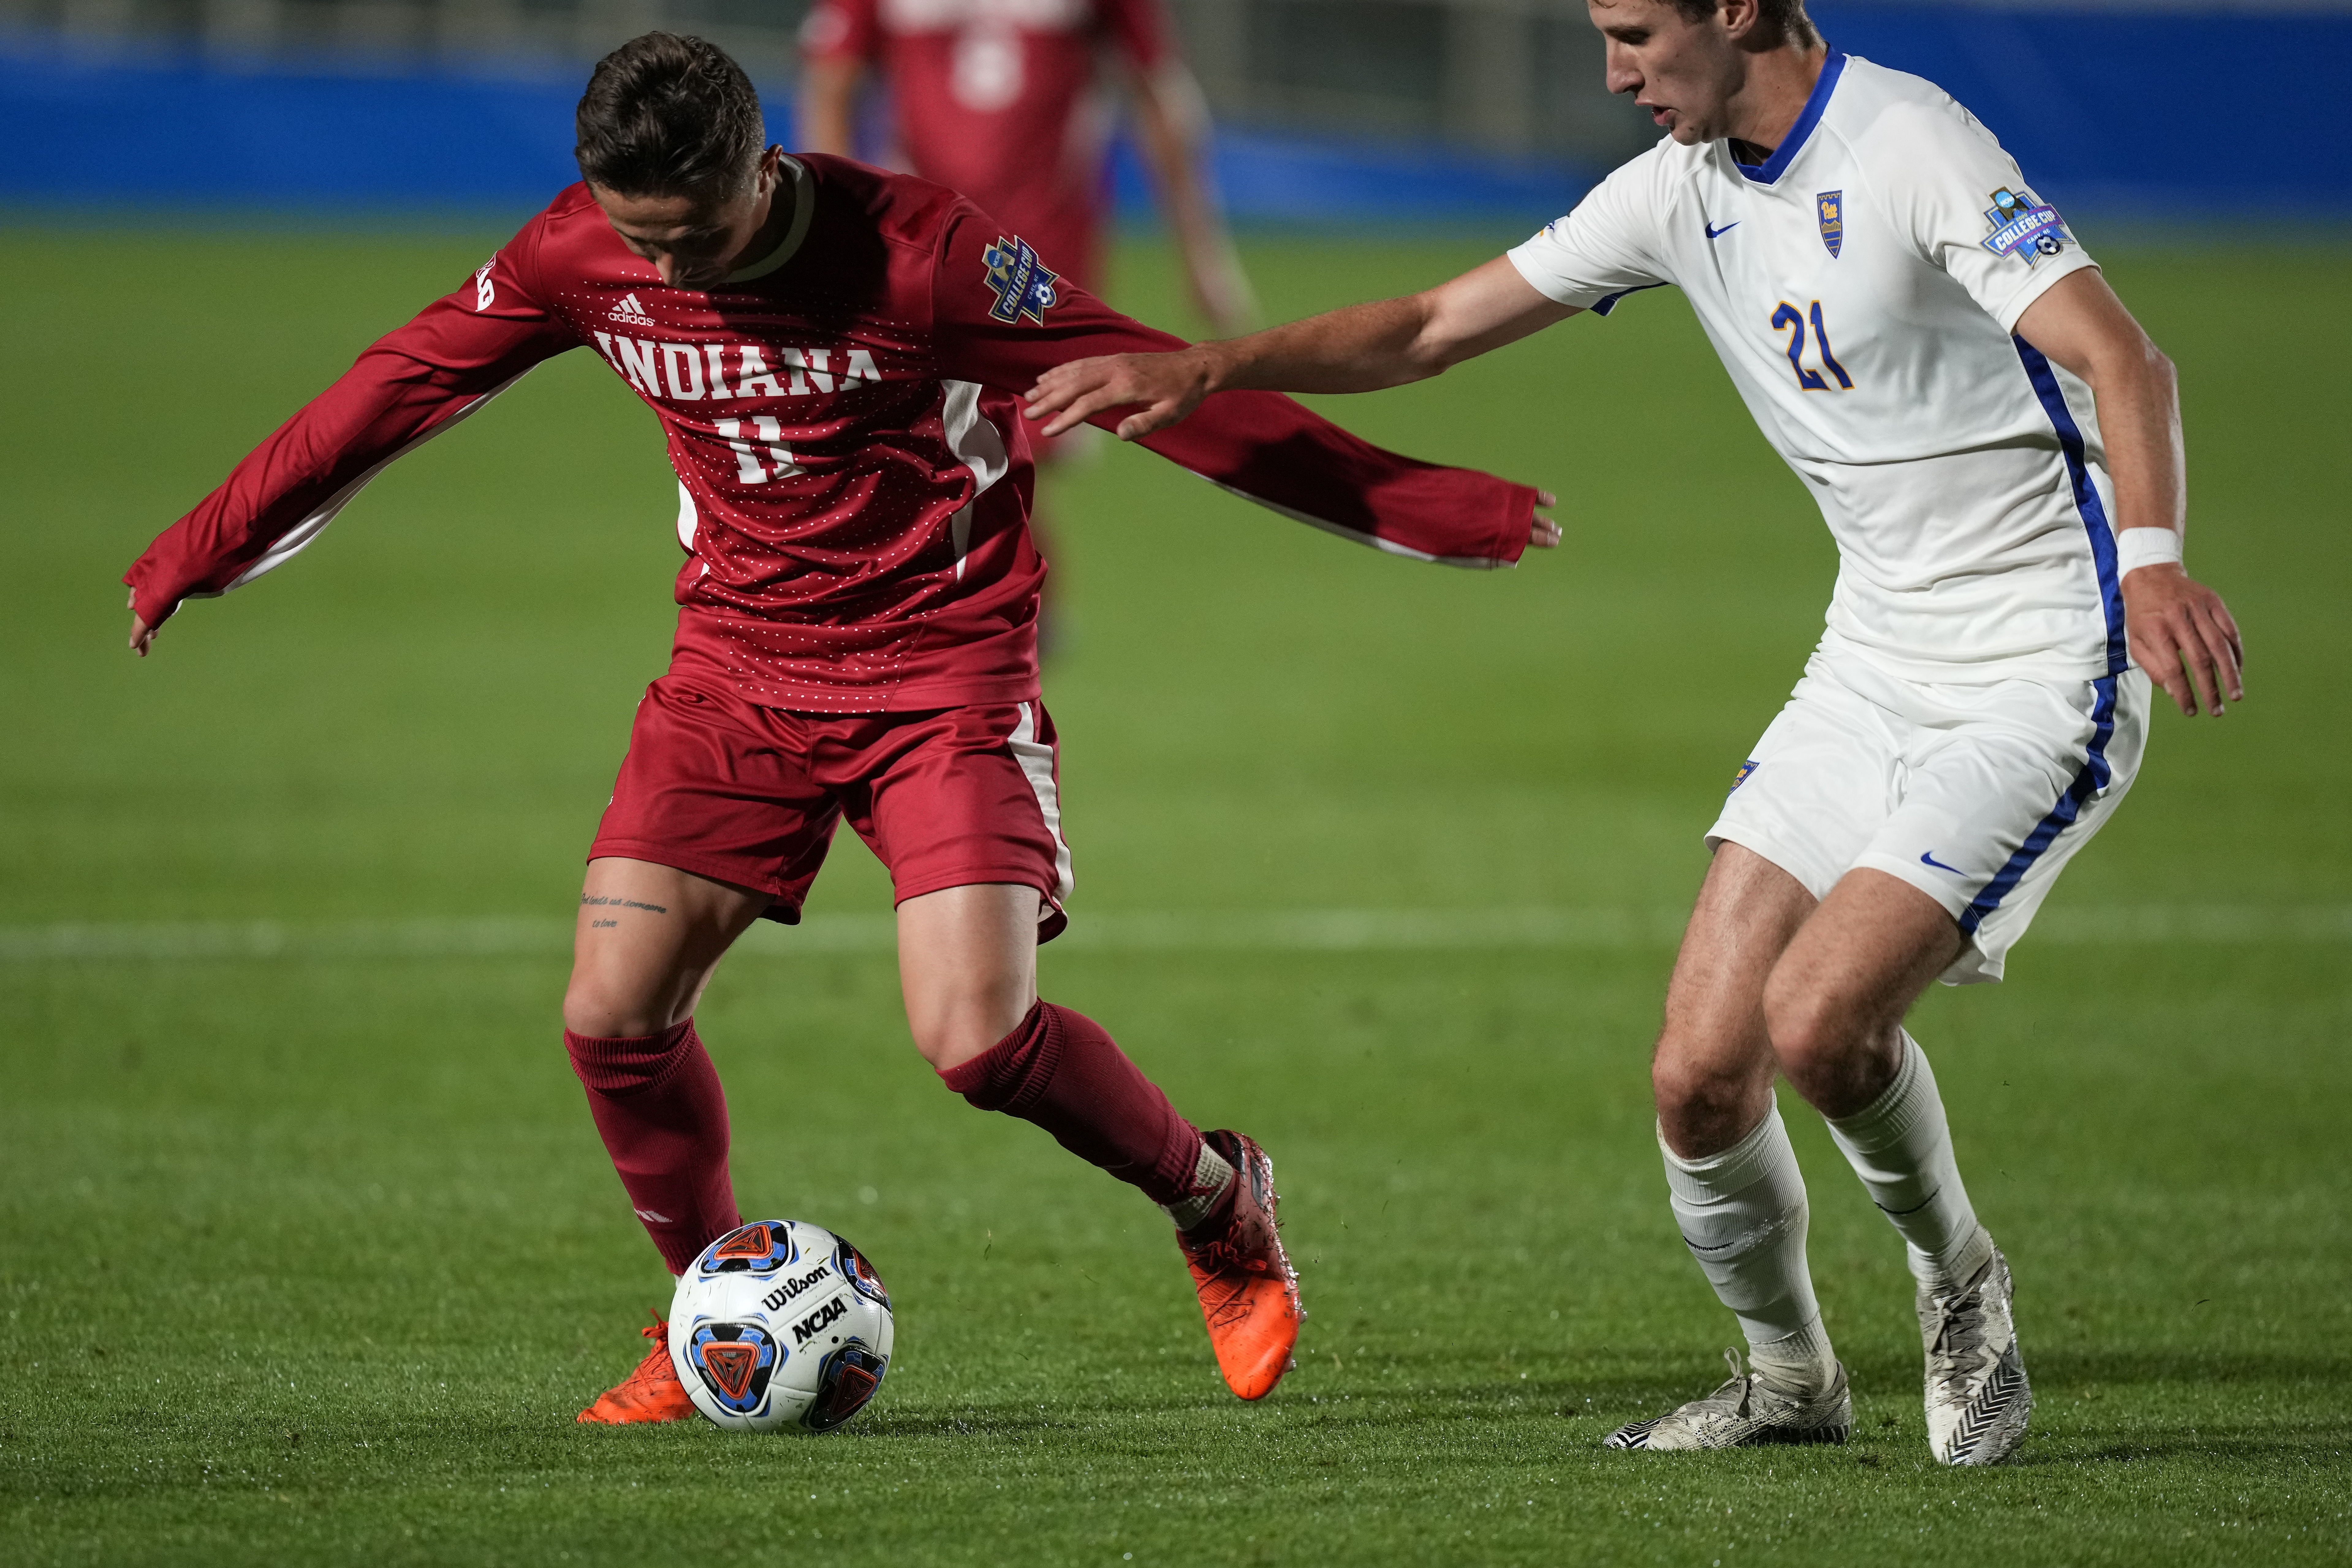 NCAA Soccer: Men's College Cup- Pitt vs Indiana